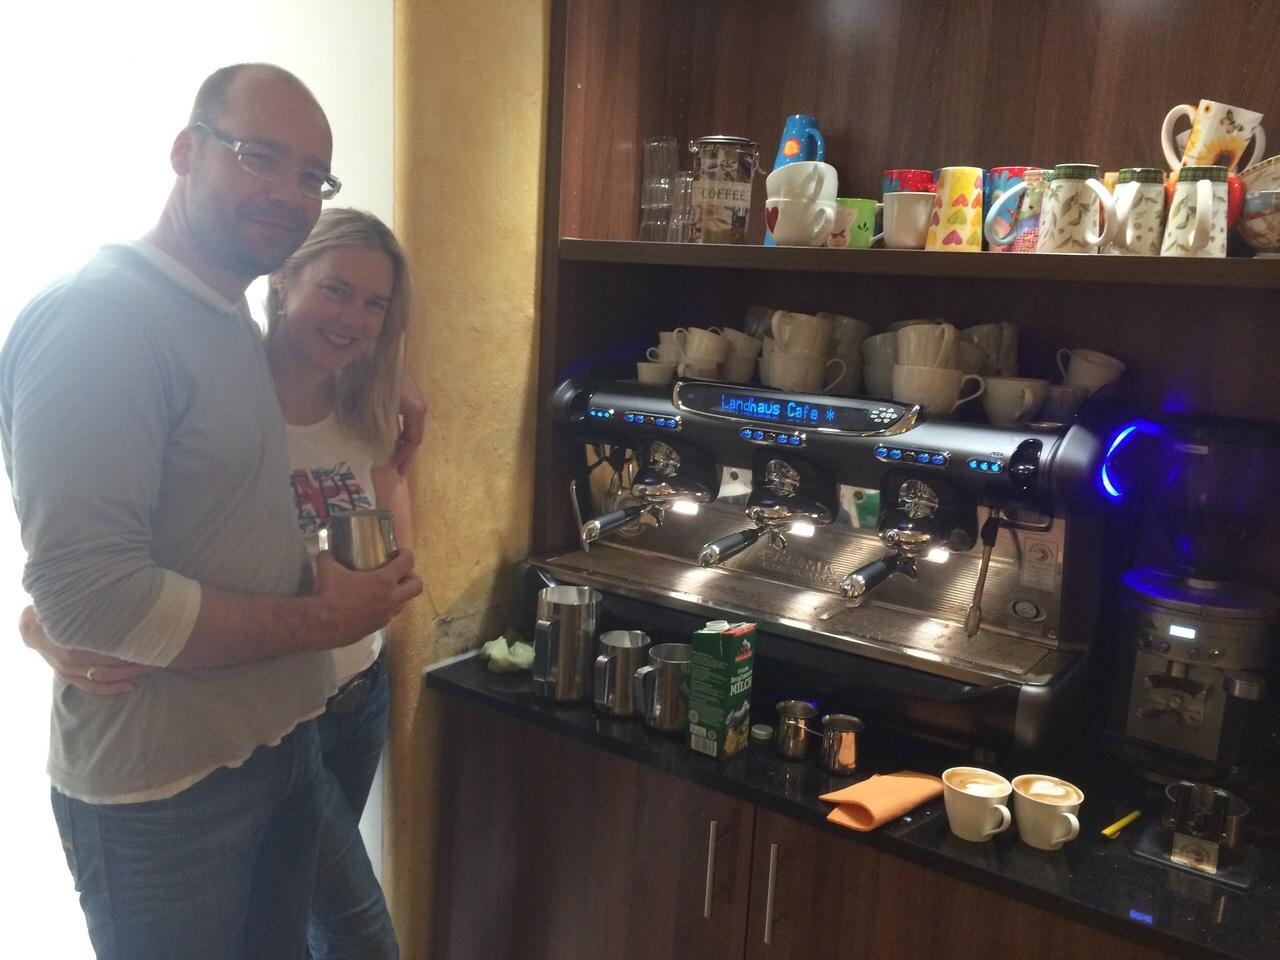 referenzen kaffeemaschinen das kaffee haus. Black Bedroom Furniture Sets. Home Design Ideas